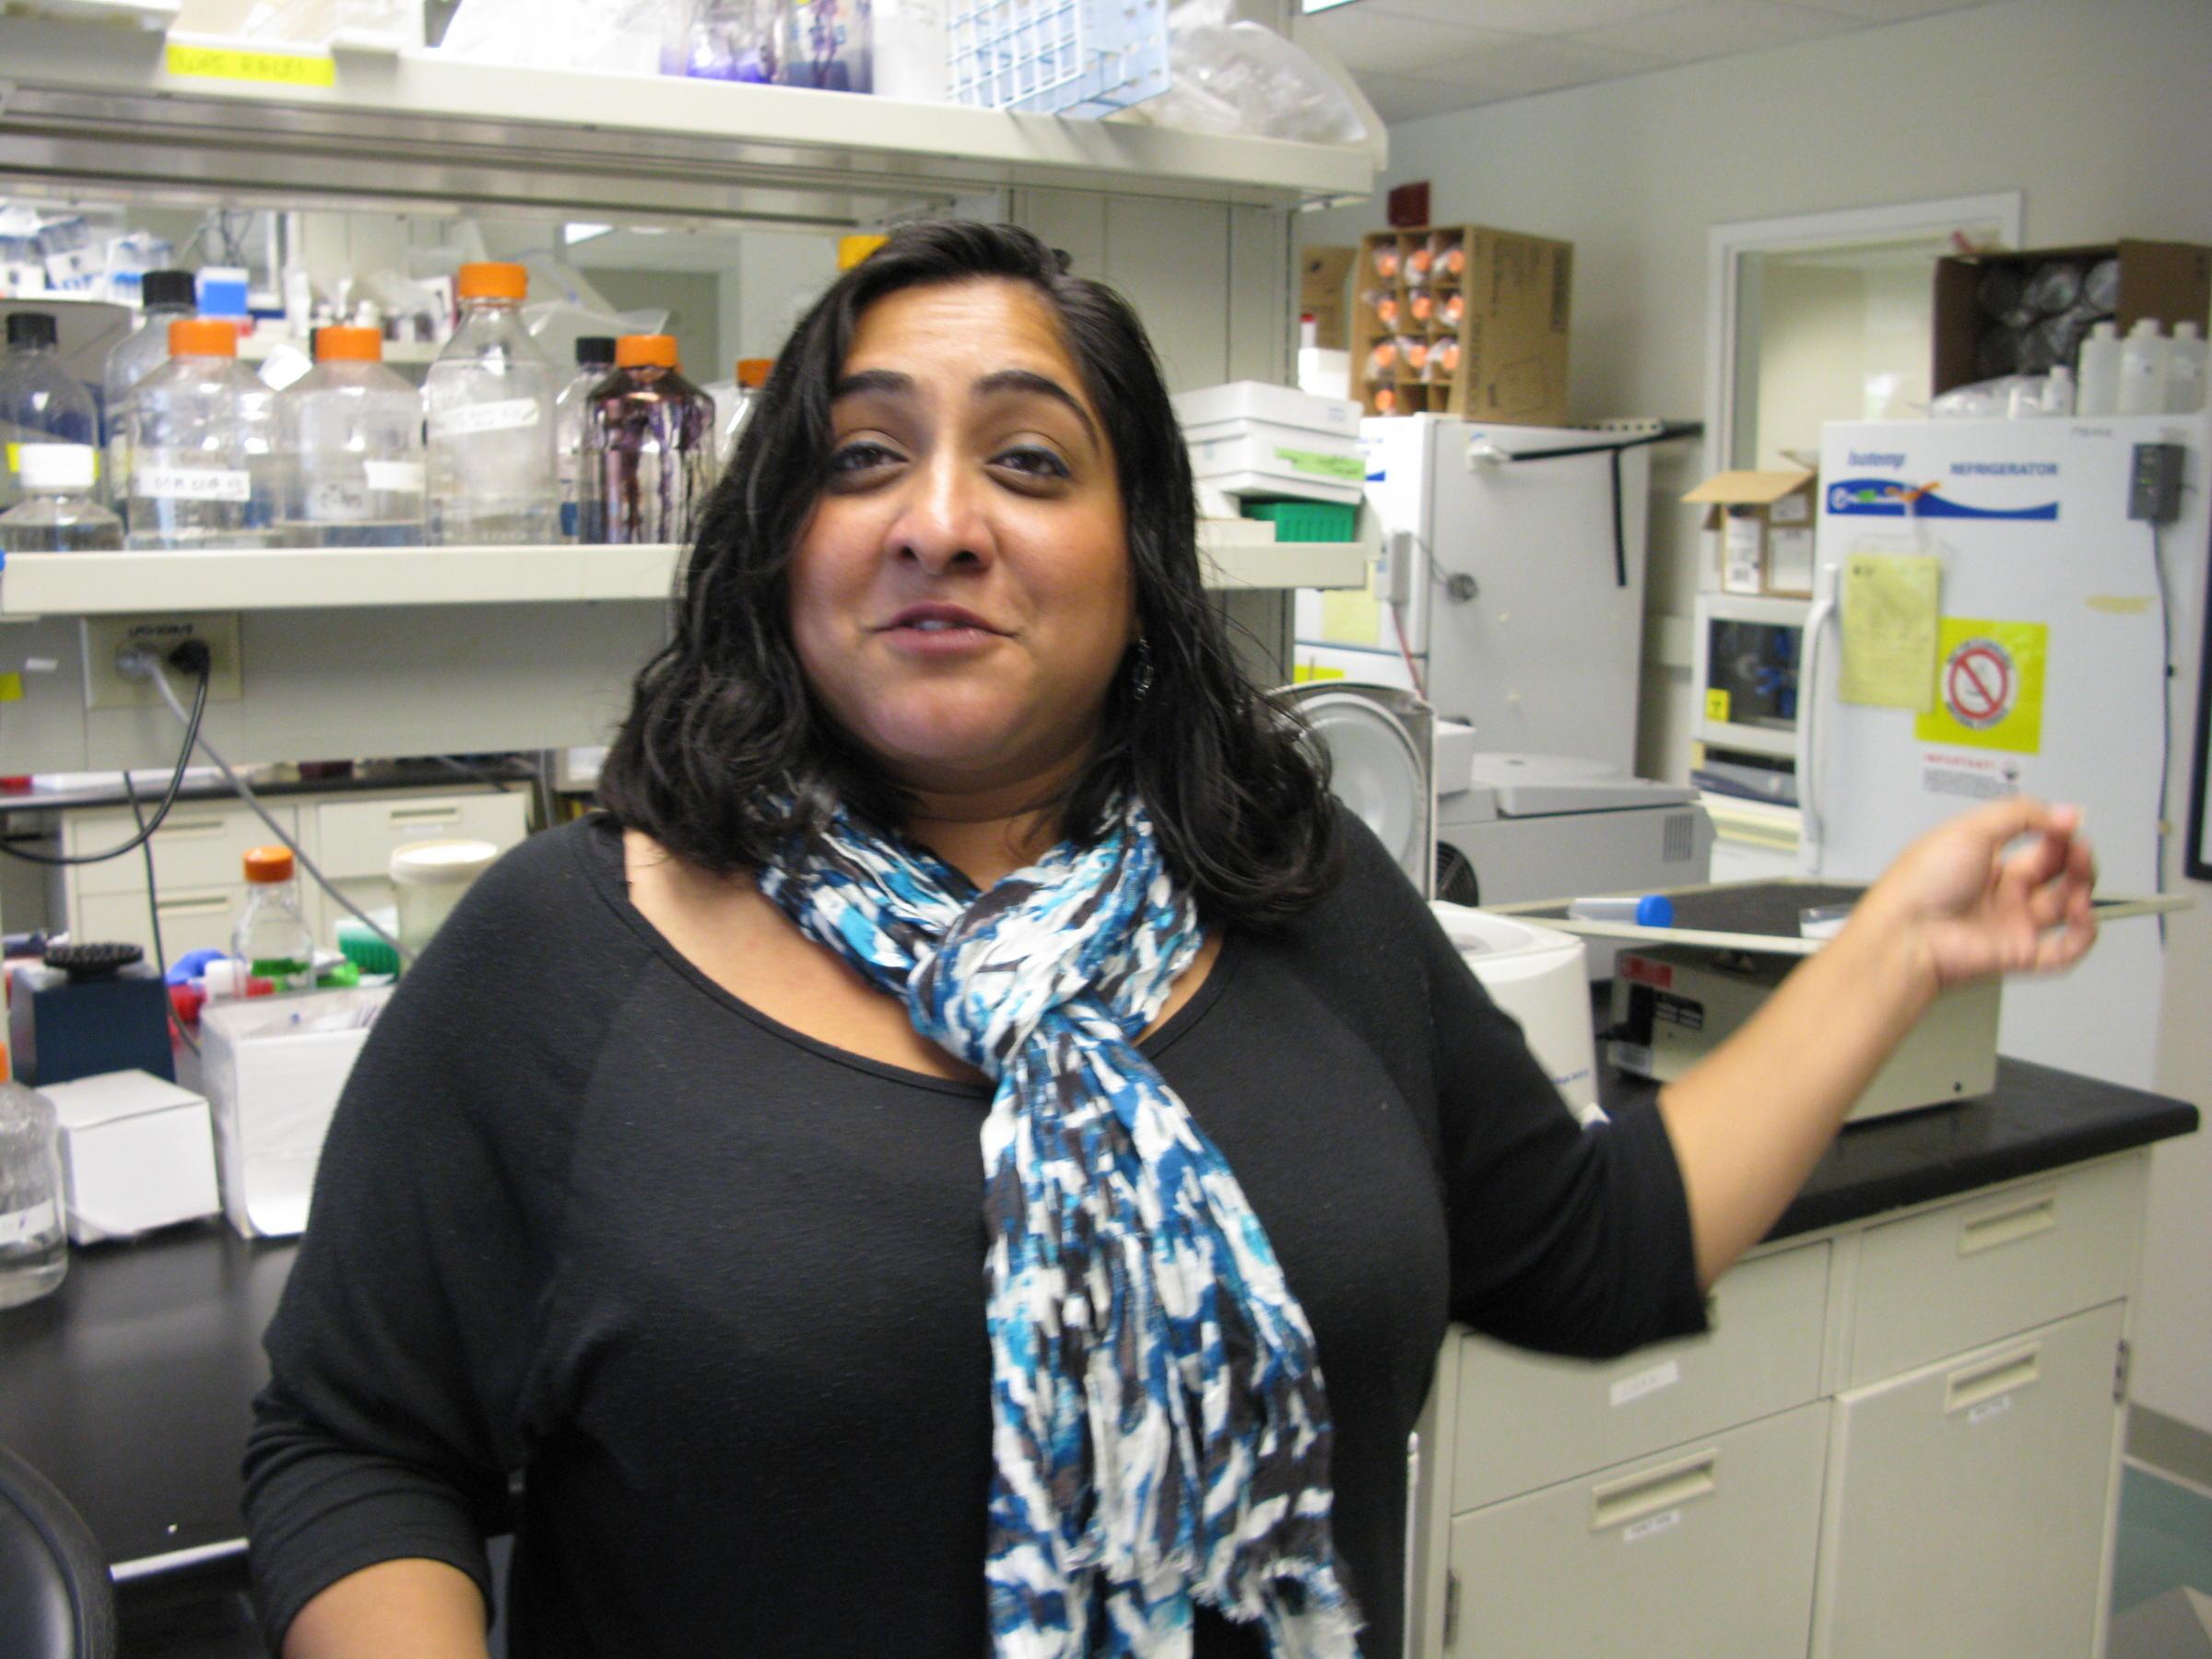 Scientist Shortage Not In Seattle